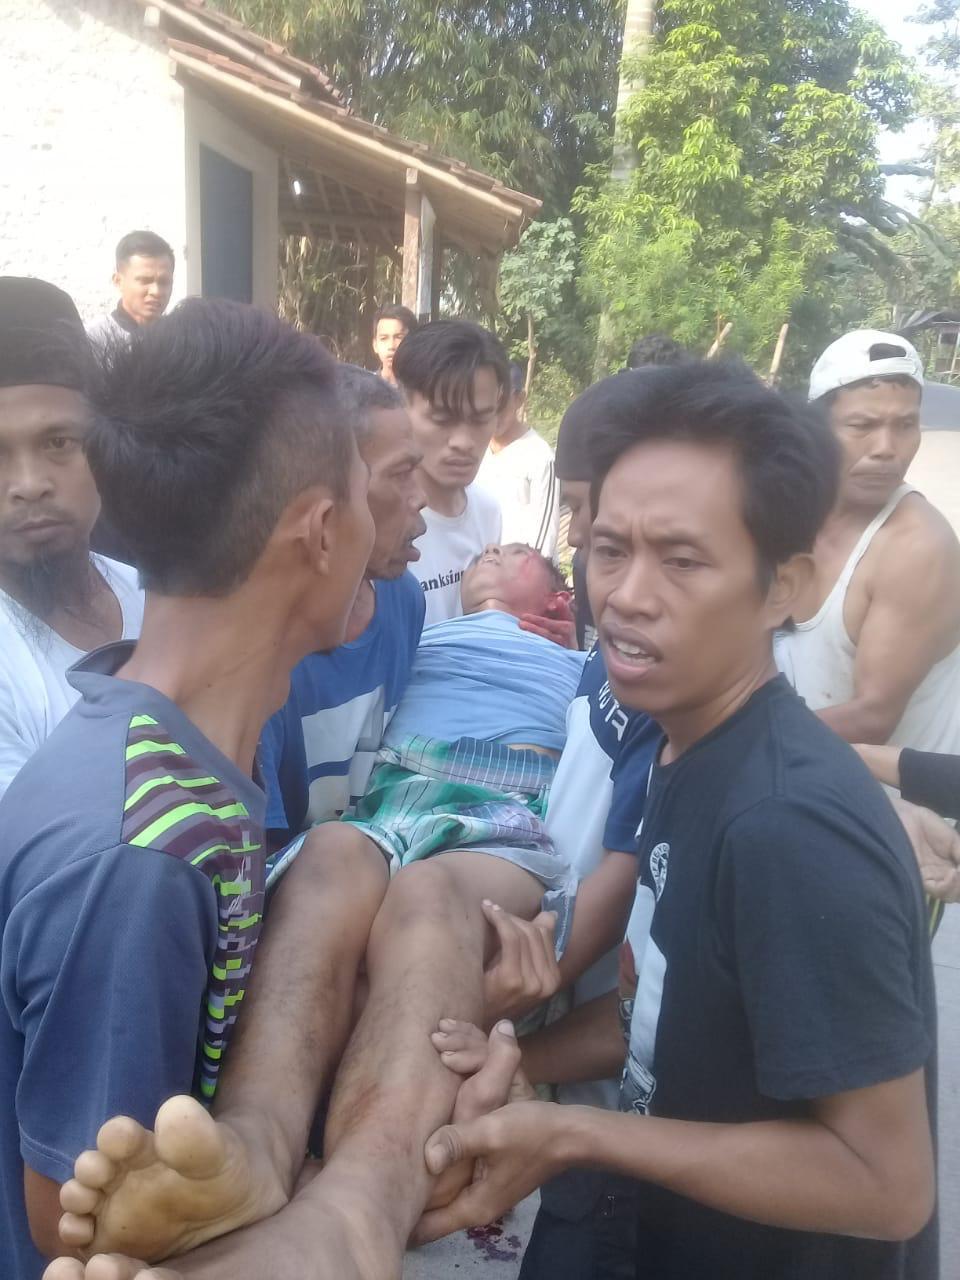 Jumat Tragis di PT Evercront Utama! 4 Jam Disiksa Lalu Dibawa ke Kamar Mandi, Ini Cerita Kematian Tragis Willy